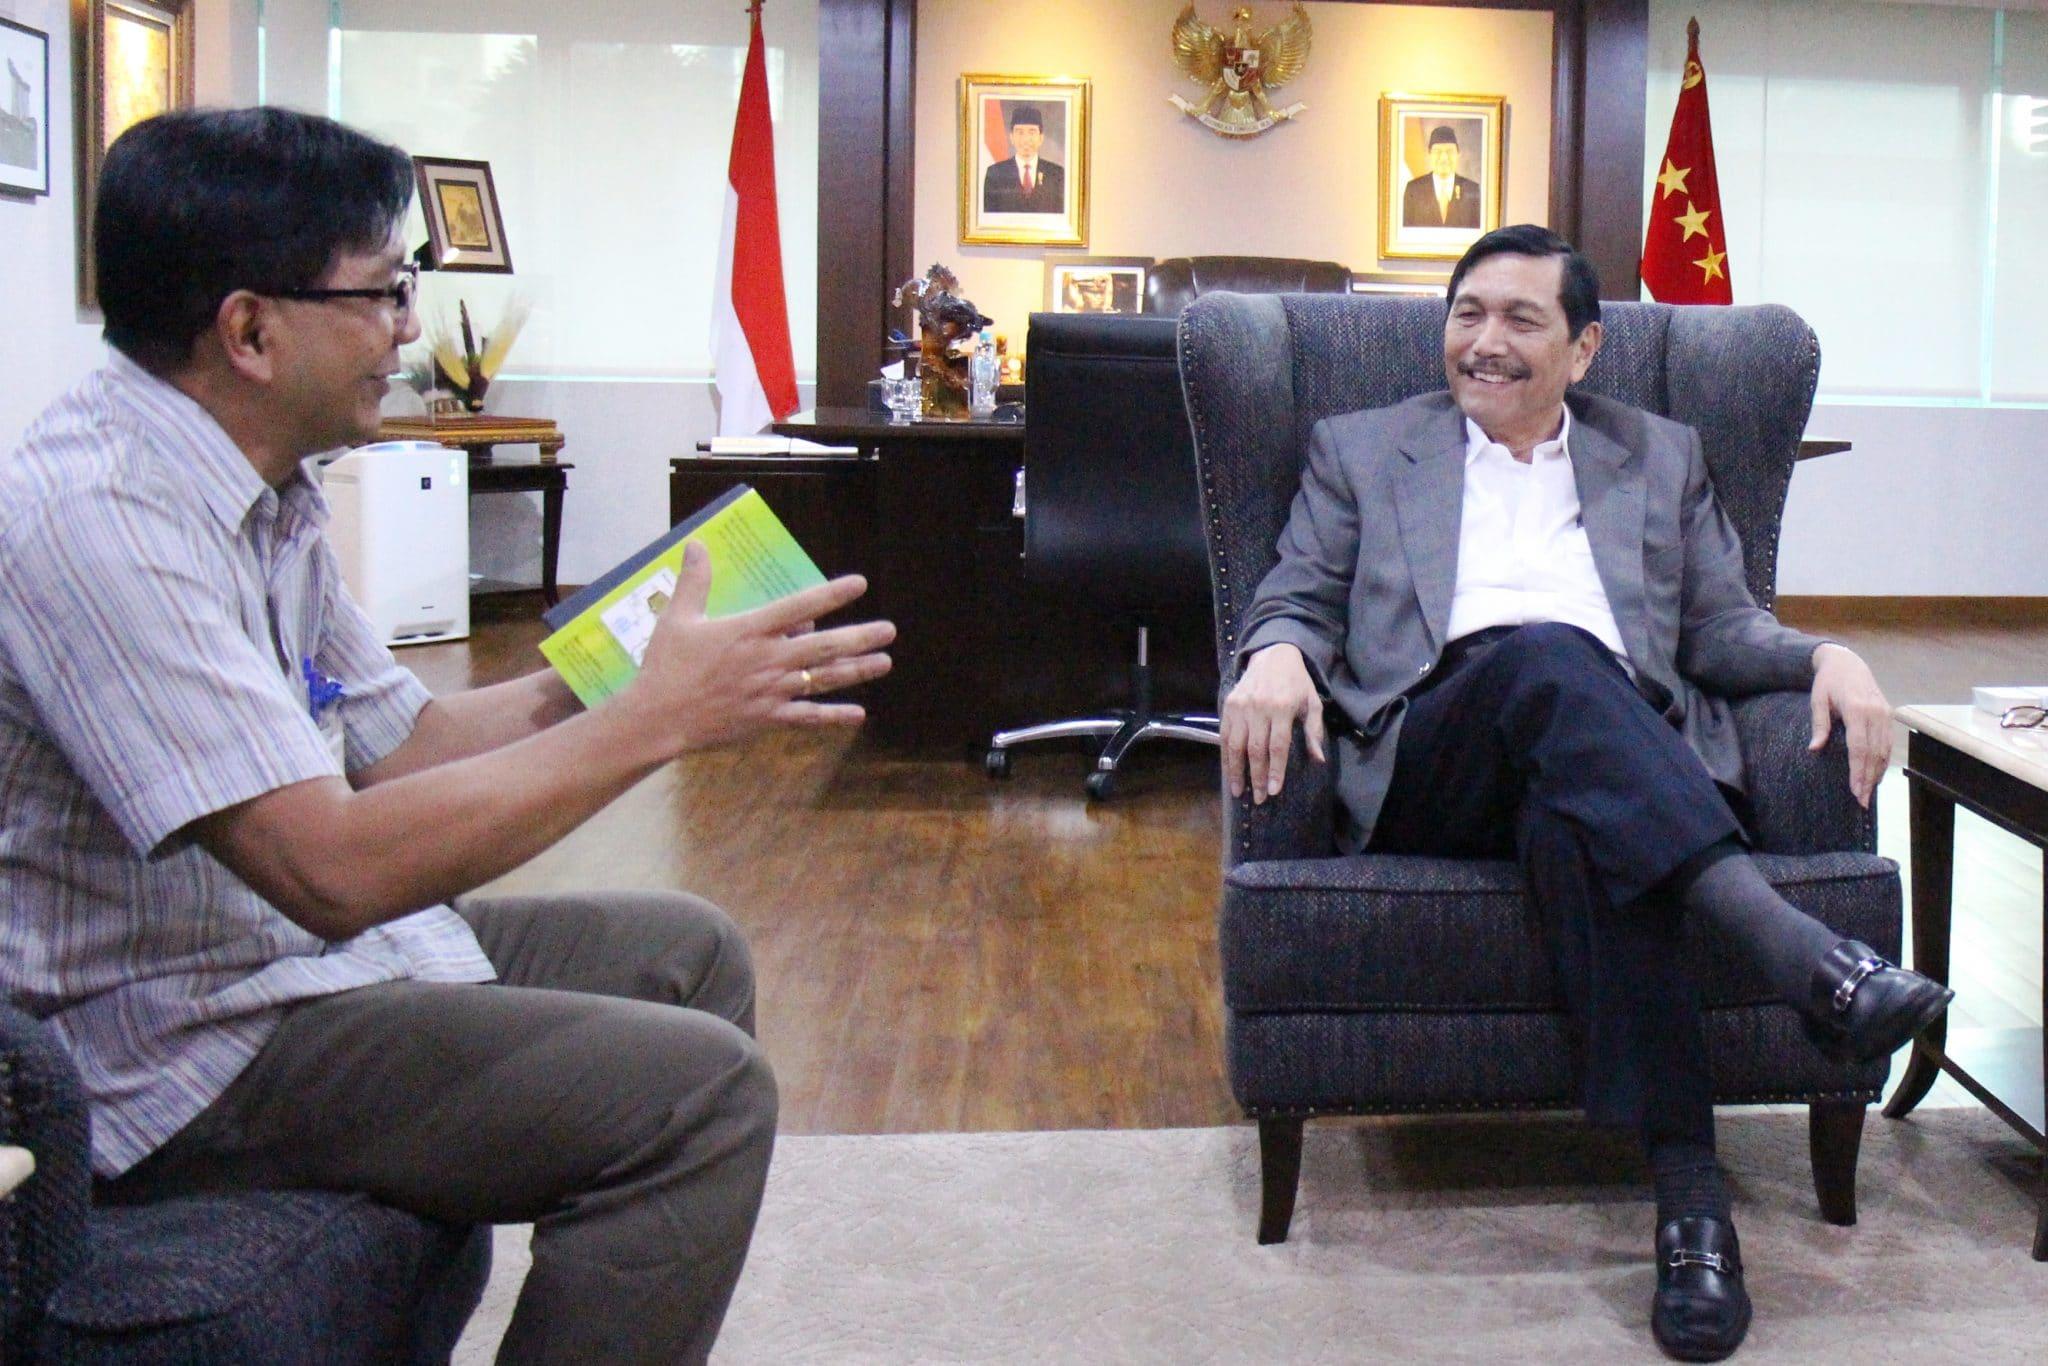 Menko Luhut Terima Audiensi Kepala BATAN Prof. Dr. Djarot Sulistio Wisnubroto